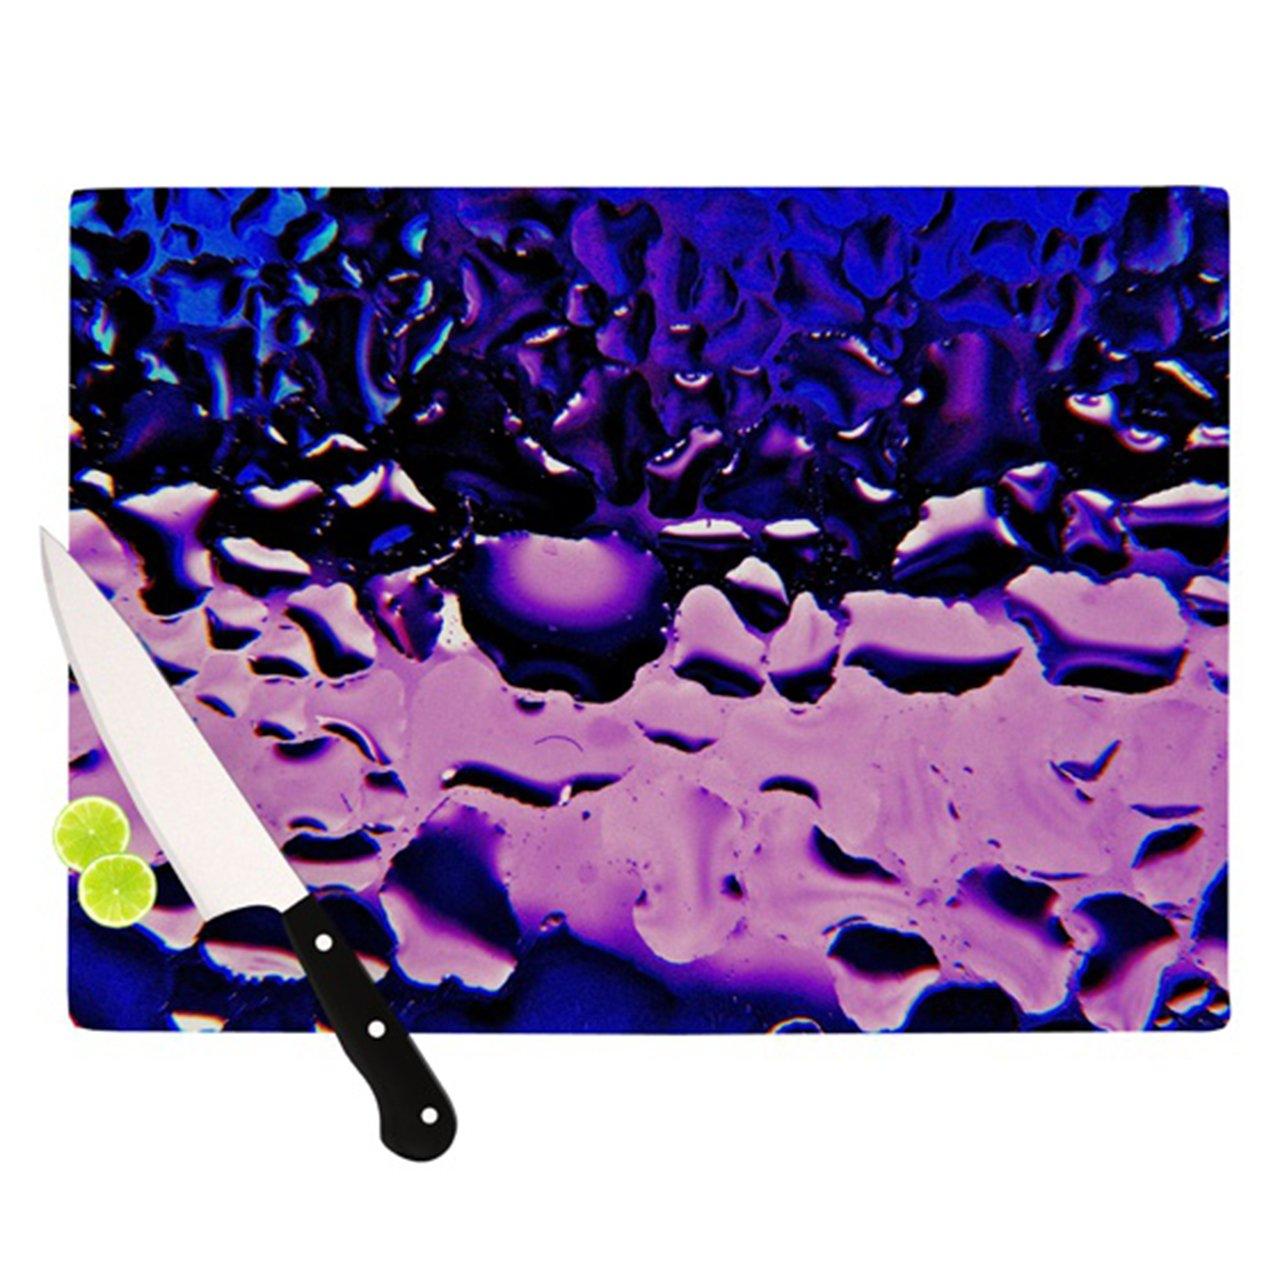 Kess InHouse Maynard Logan Cutting Board, 11.5 by 15.75-Inch, Window Purple